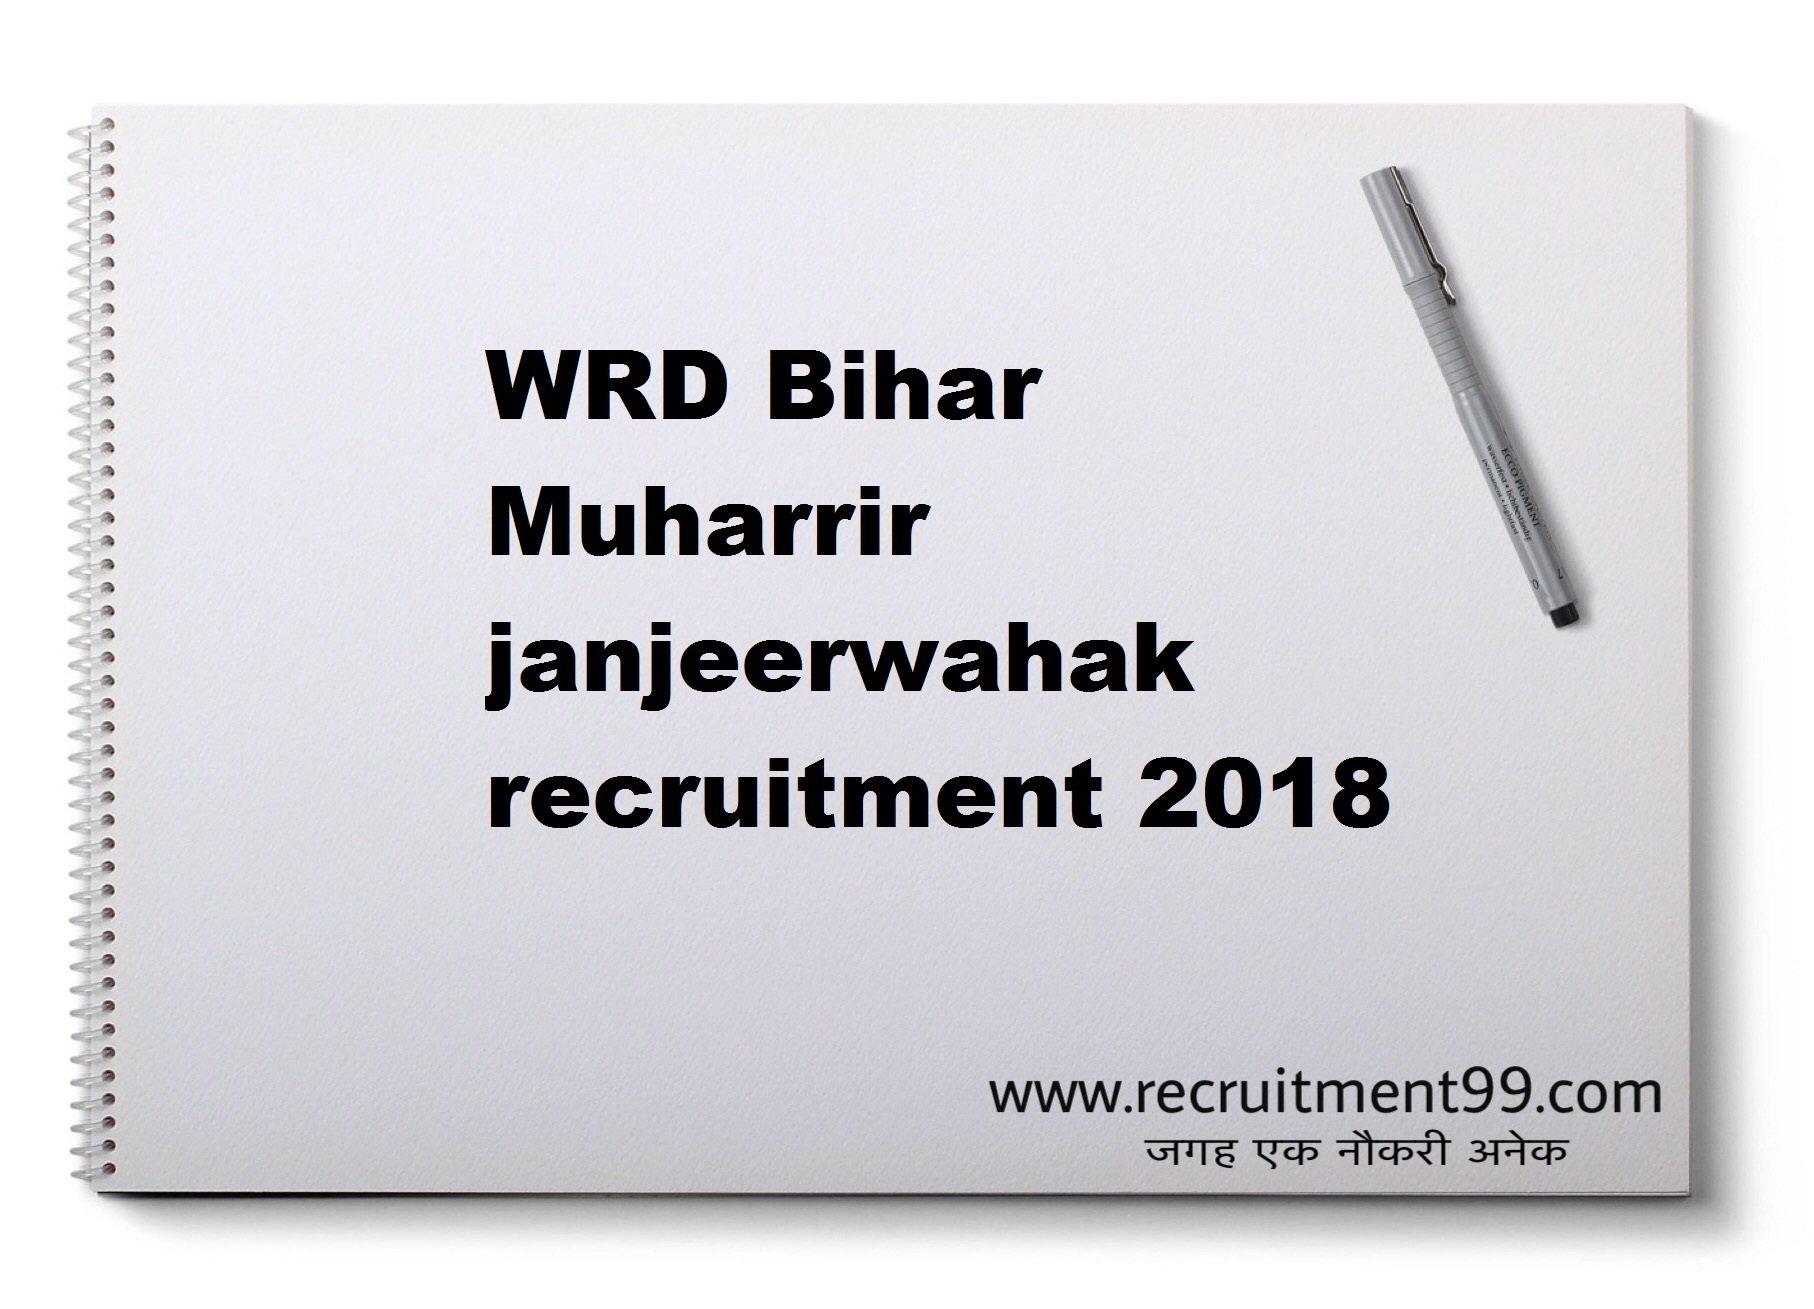 WRD Bihar Muharrir janjeerwahak recruitment Admit Card Result 2018